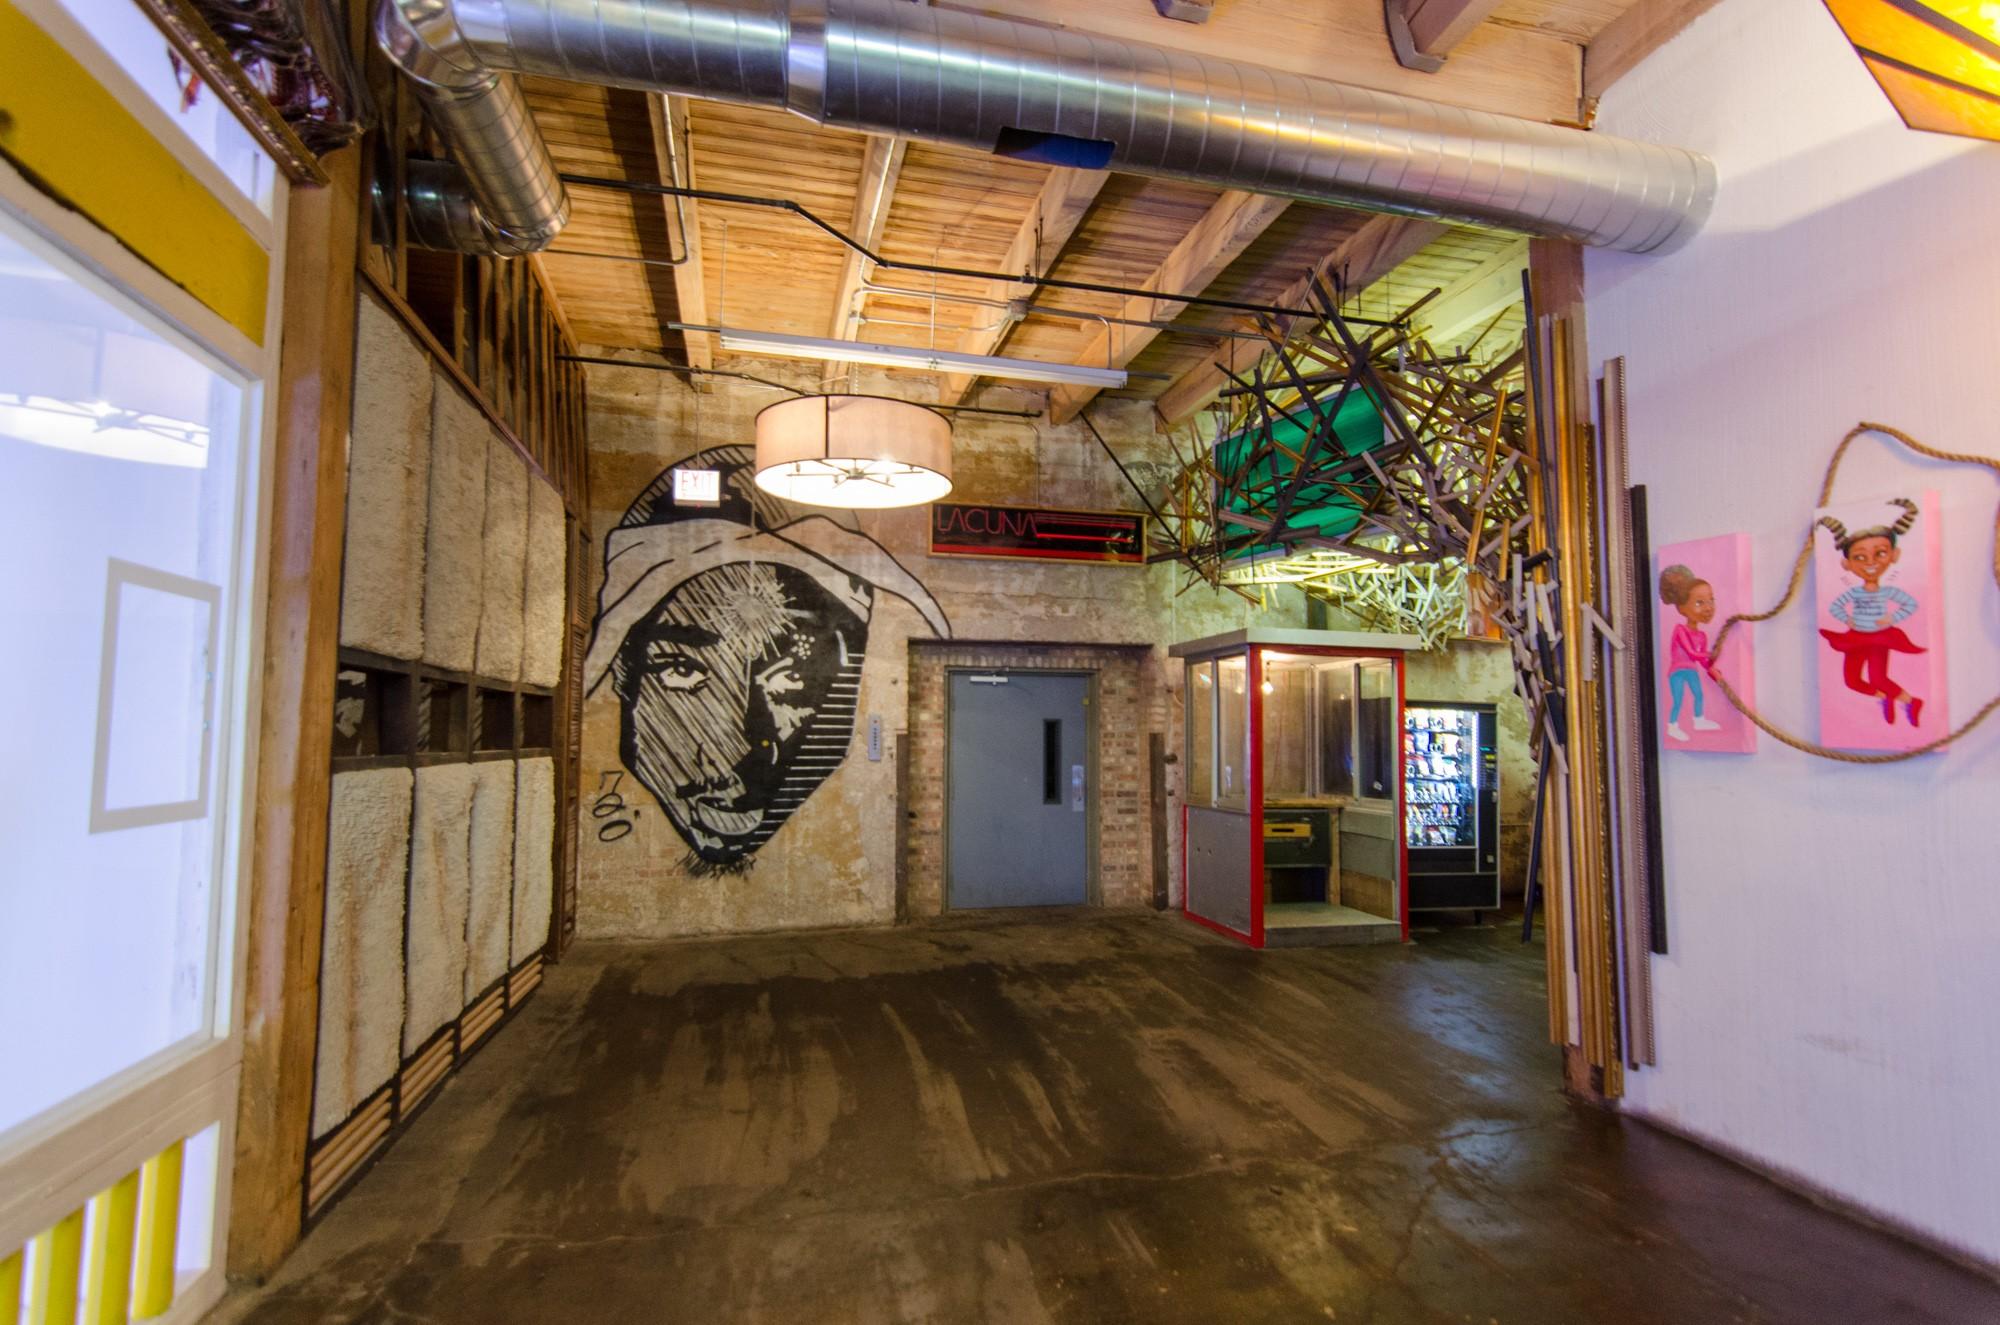 Lacuna Artist Lofts 183 Sites 183 Open House Chicago